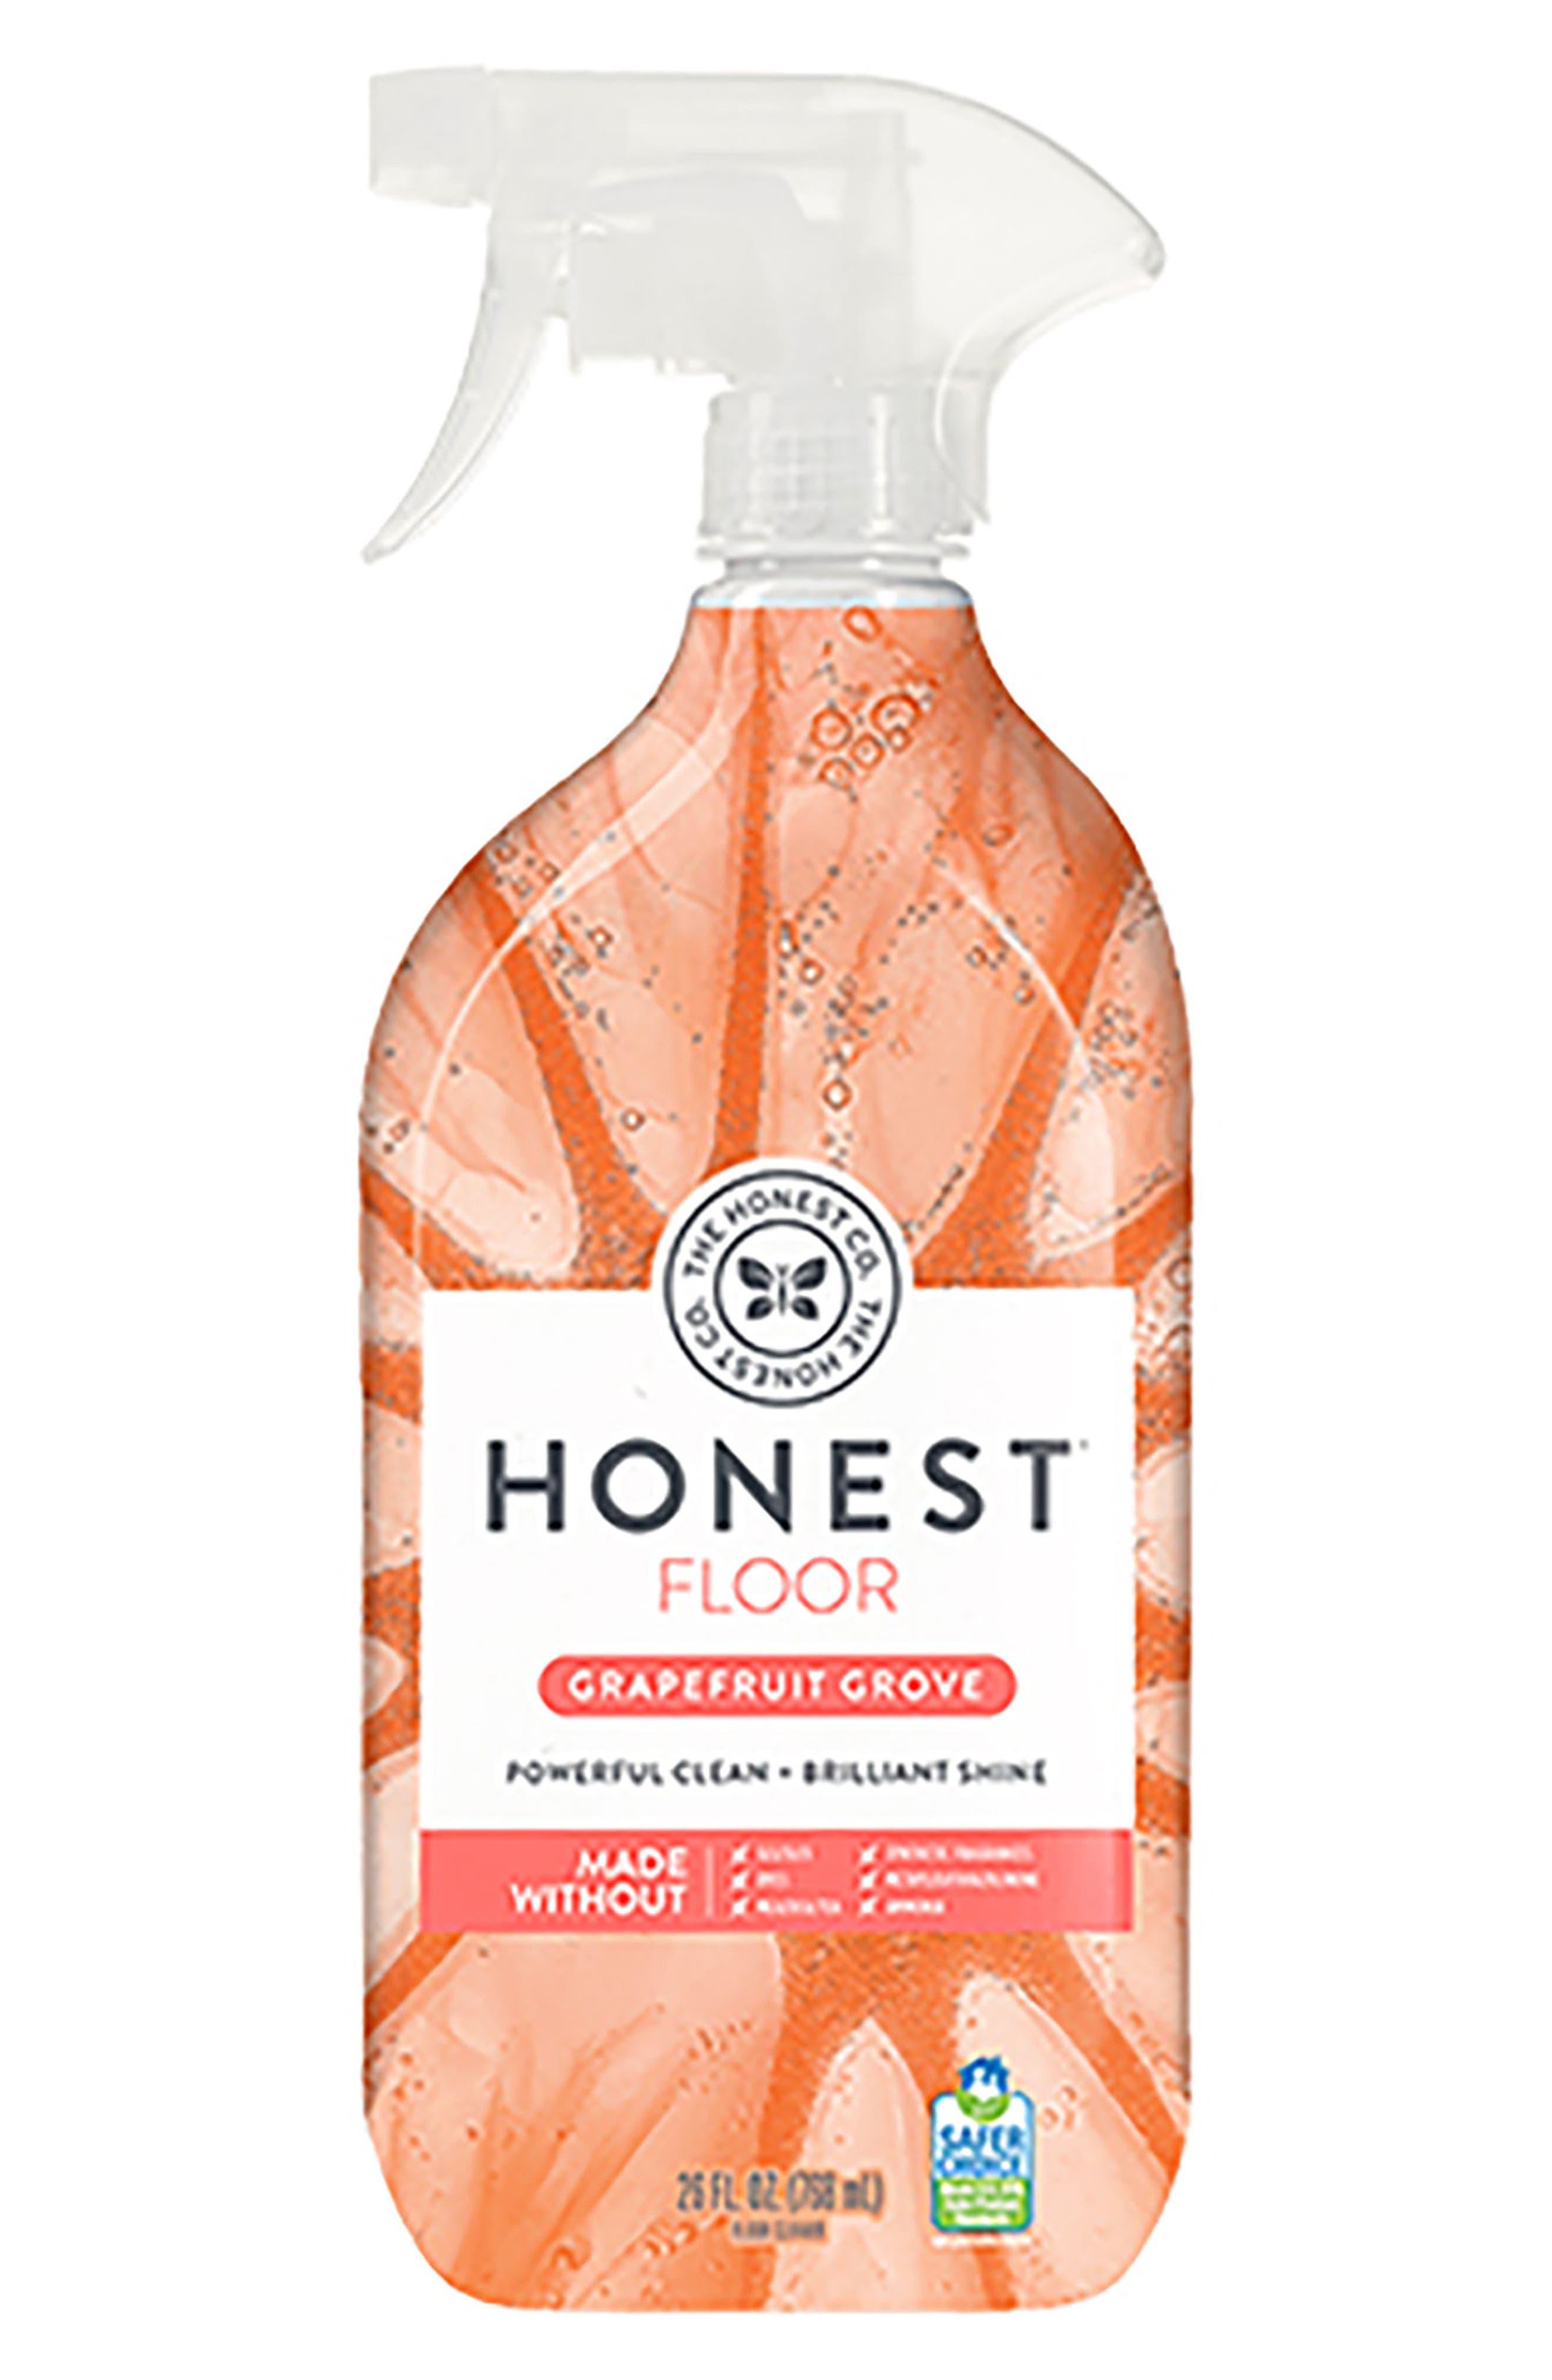 The Honest Company Grapefruit Grove Floor Cleaner